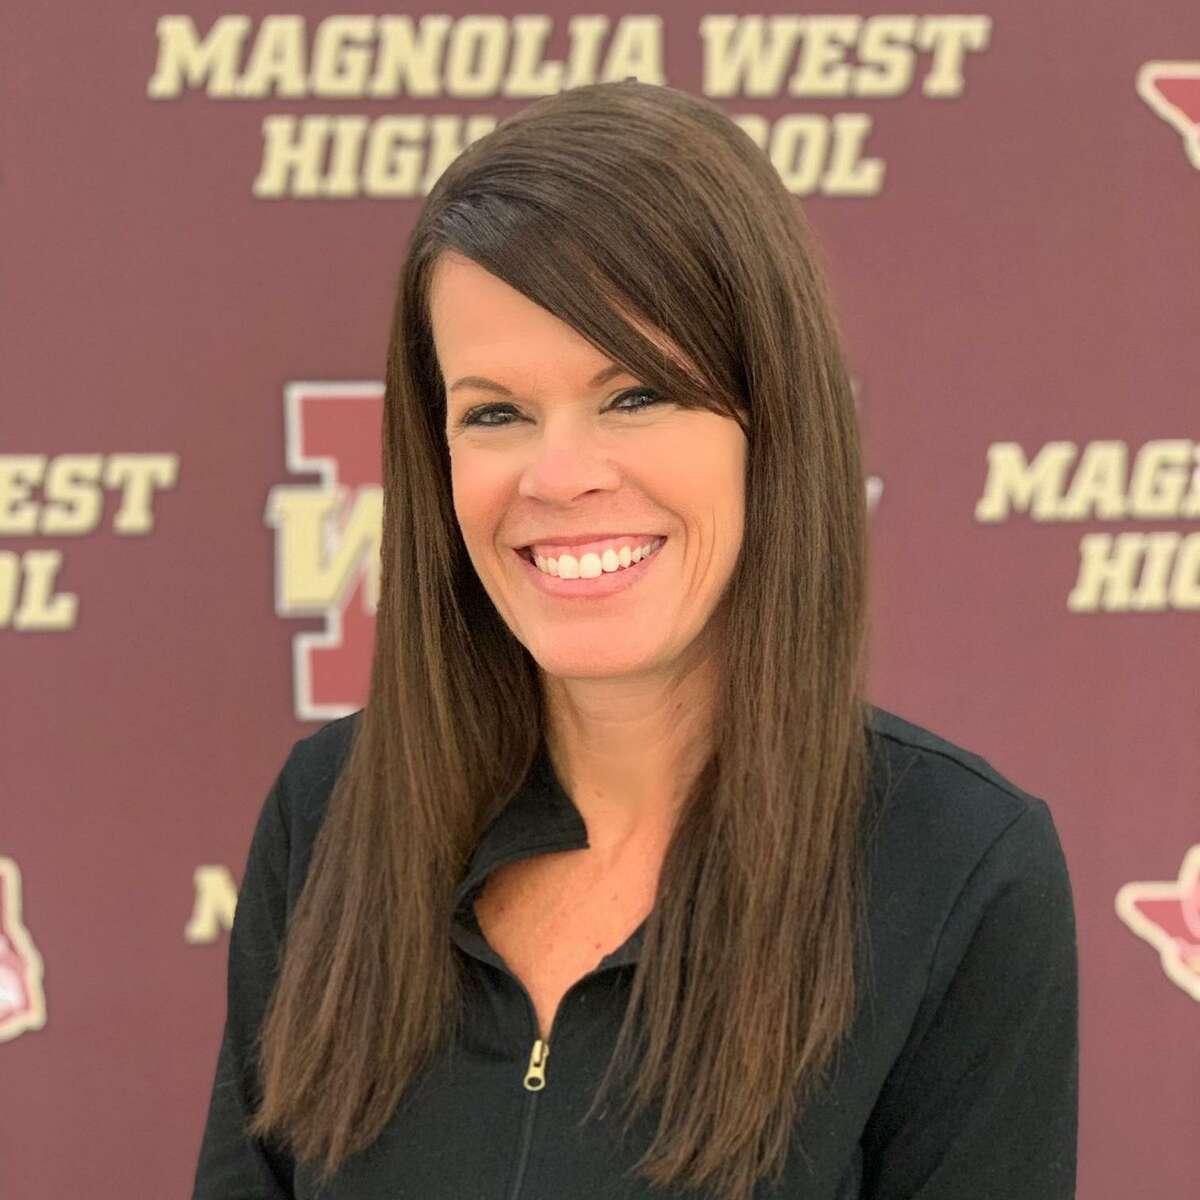 Magnolia West girls soccer coach Heather McCallum.